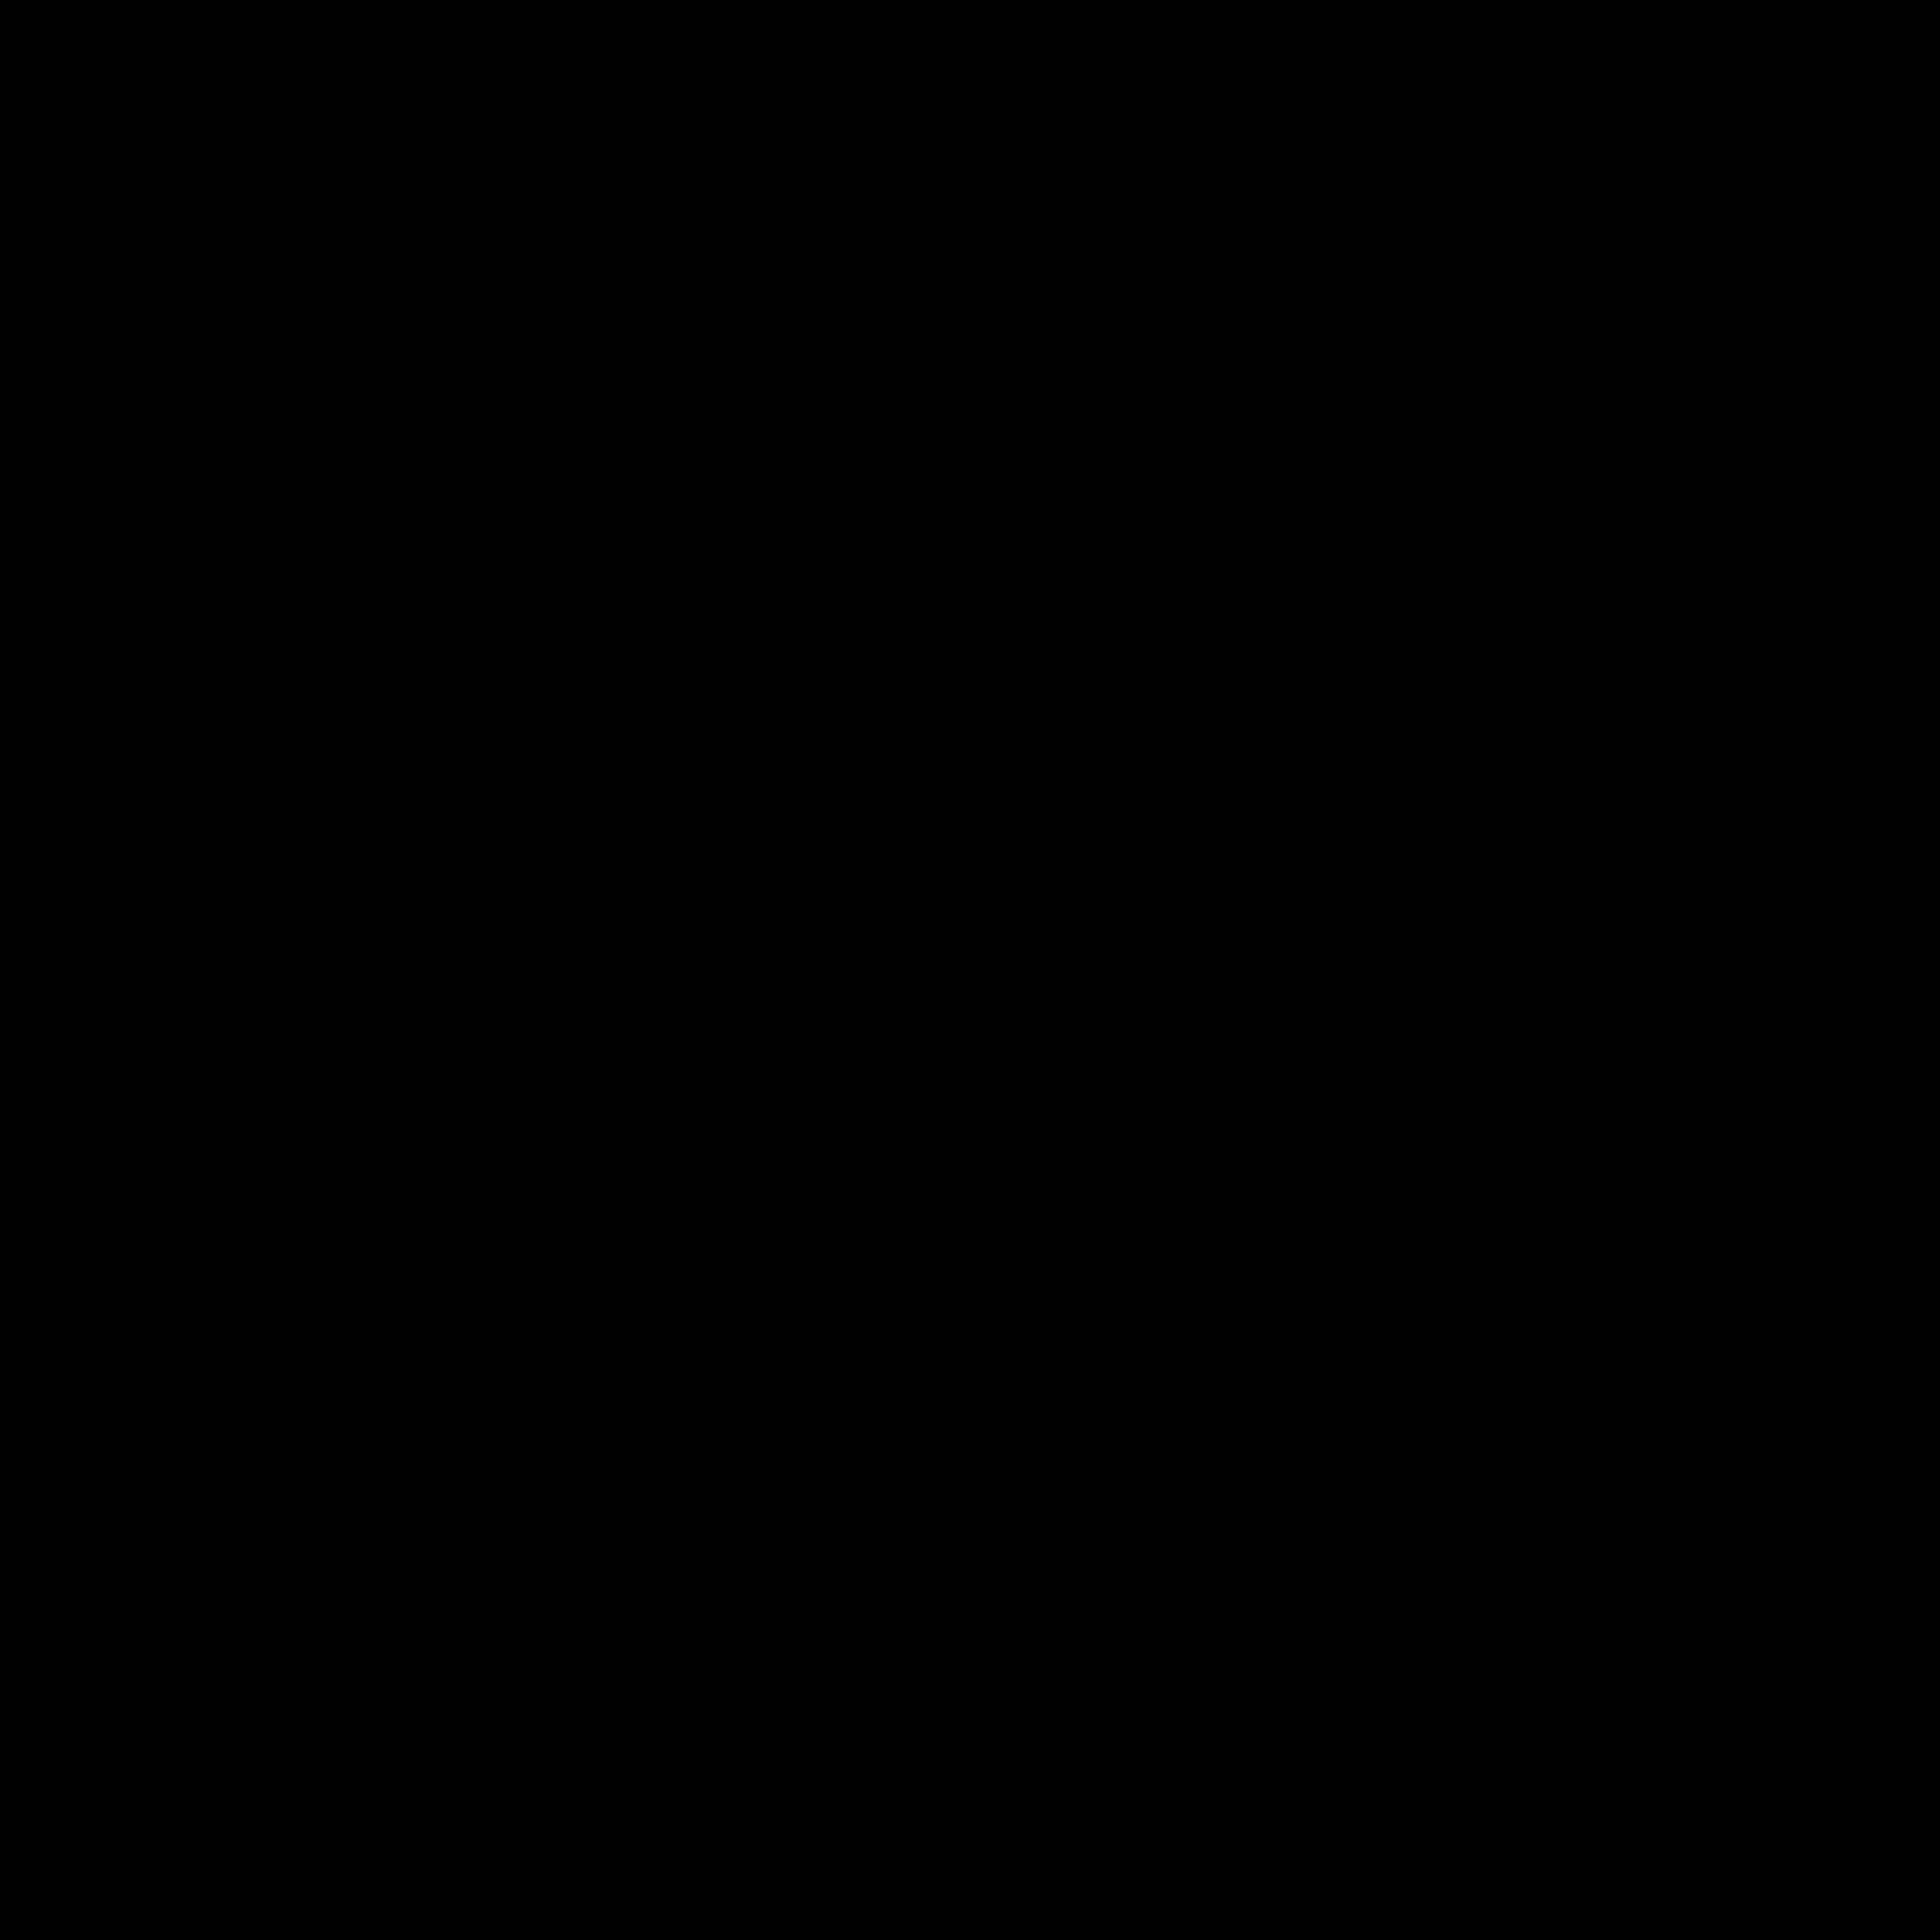 Beer Brand Logo-2-3.png